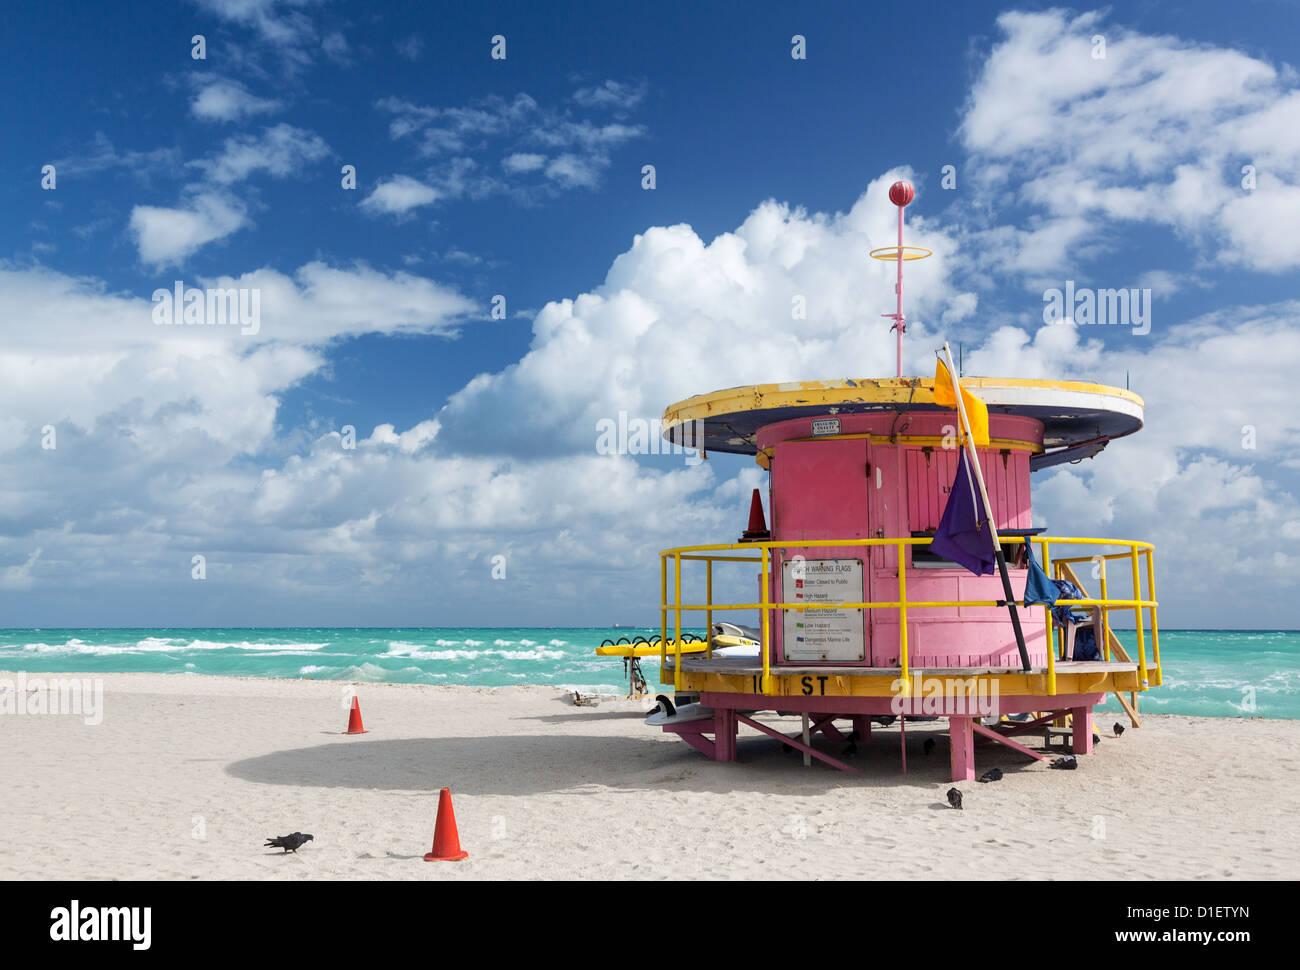 Miami beach, Florida, USA - lifeguard station - Stock Image